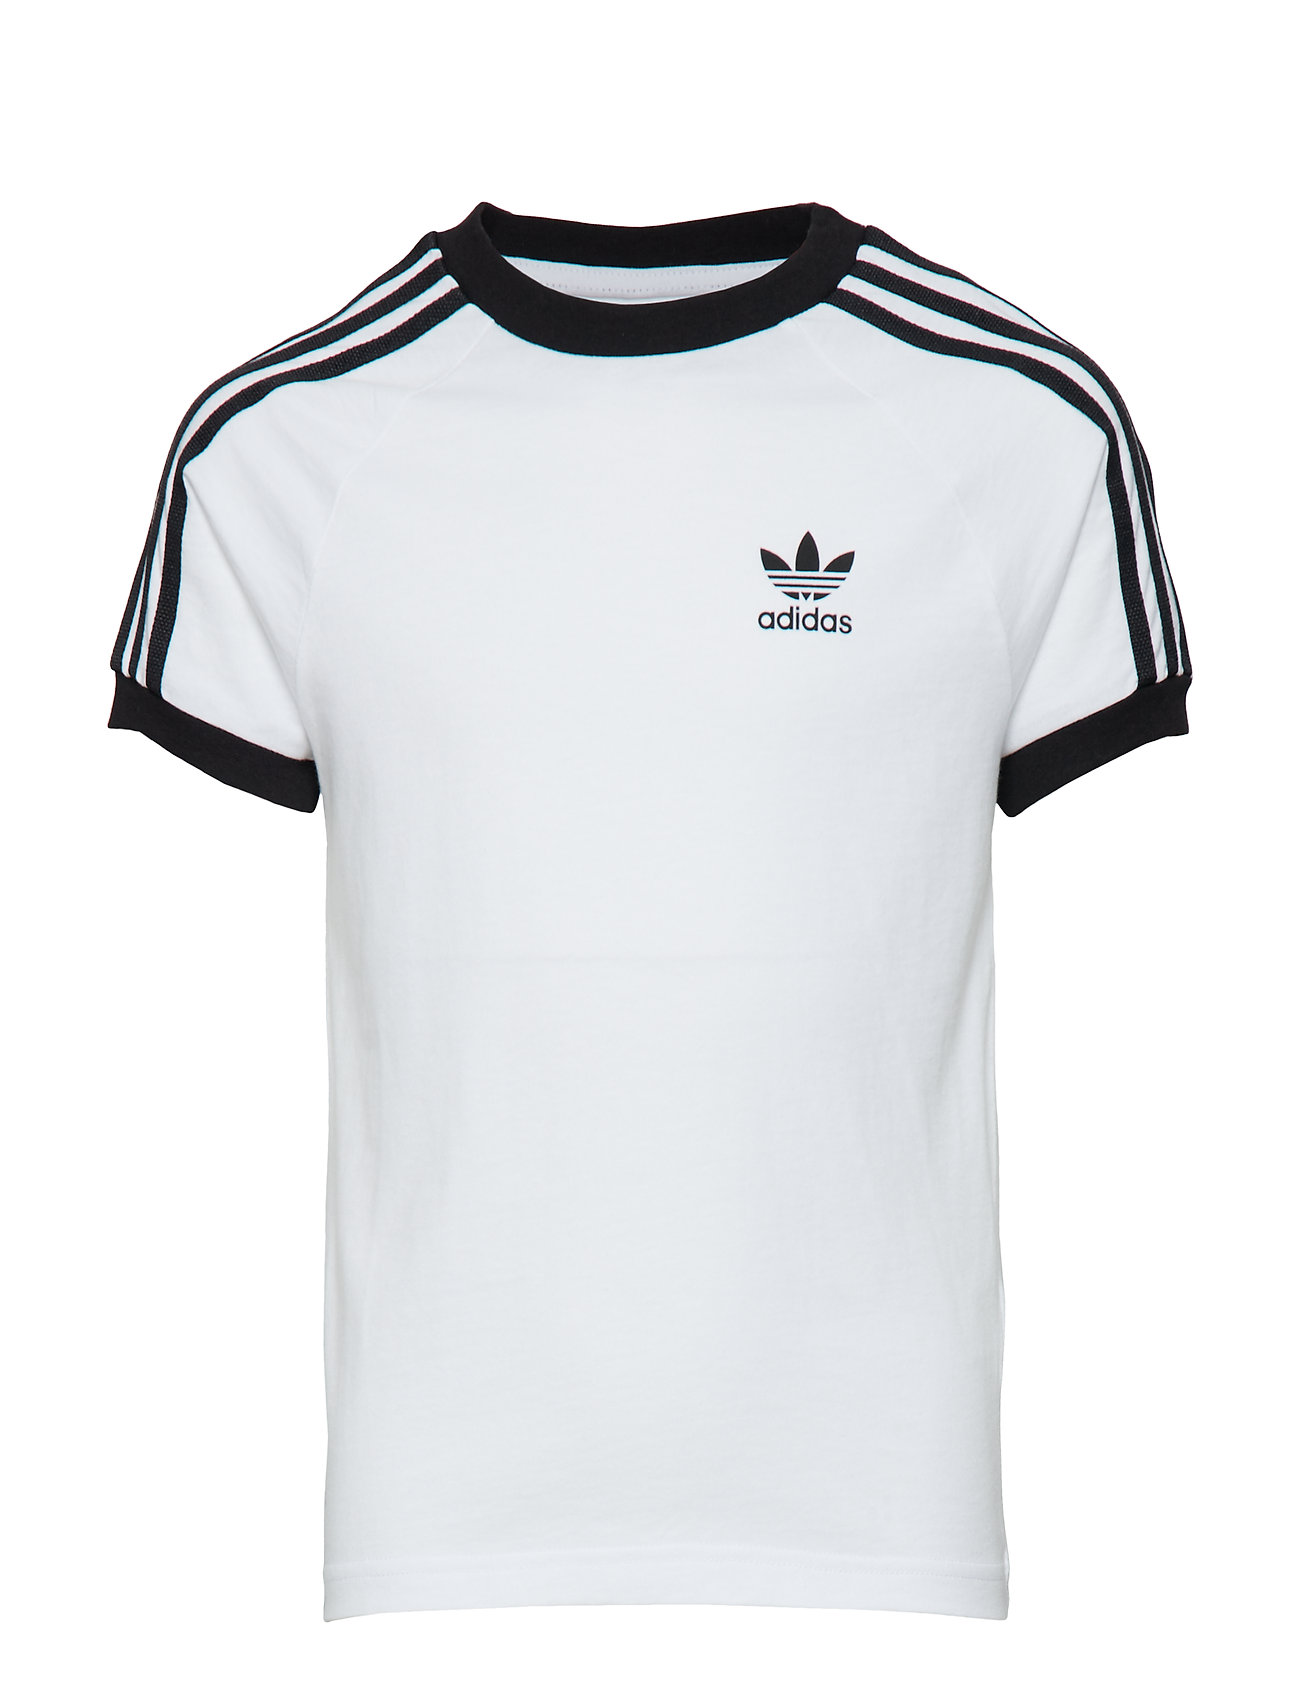 adidas Originals 3STRIPES TEE - WHITE/BLACK